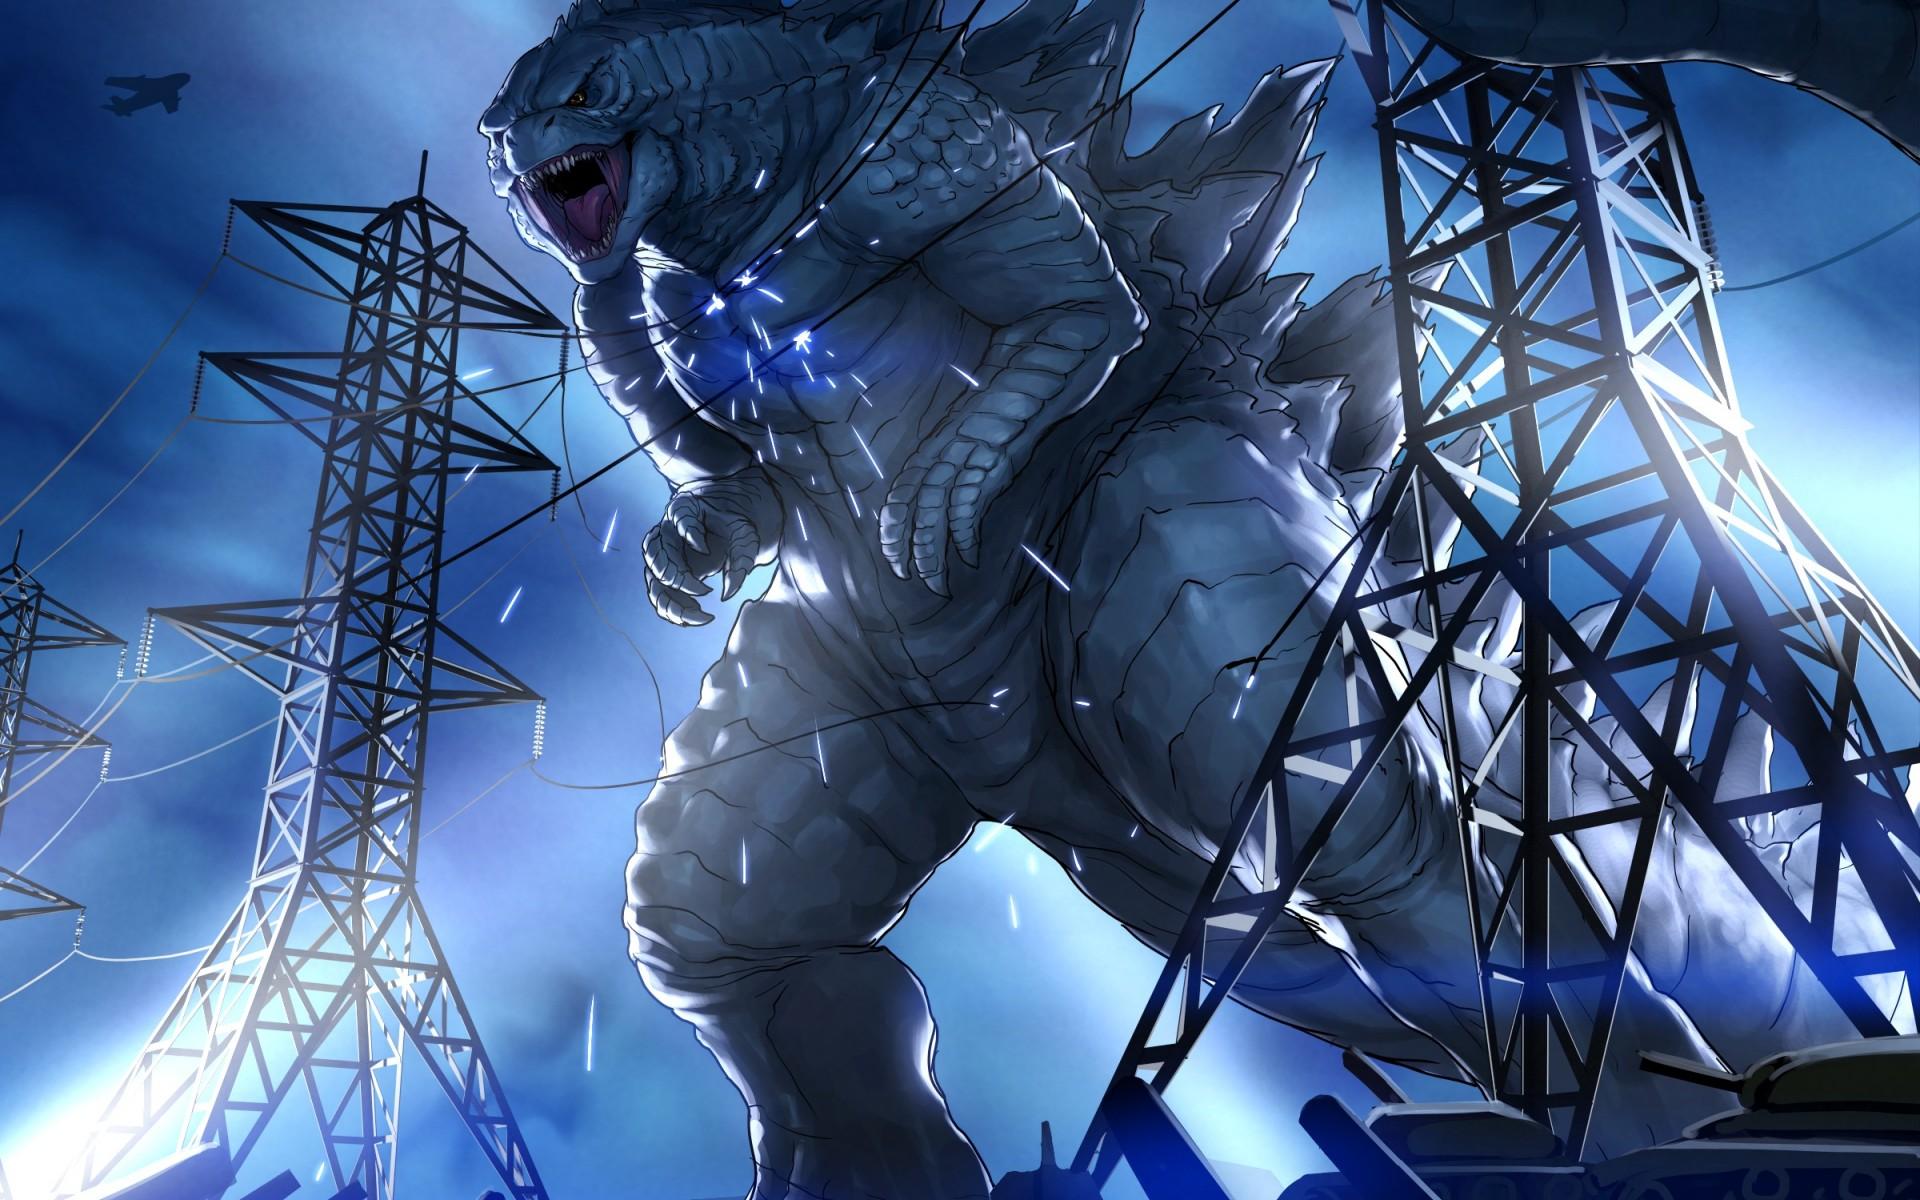 Wallpaper Godzilla art destruction angry HD desktop background 1920x1200